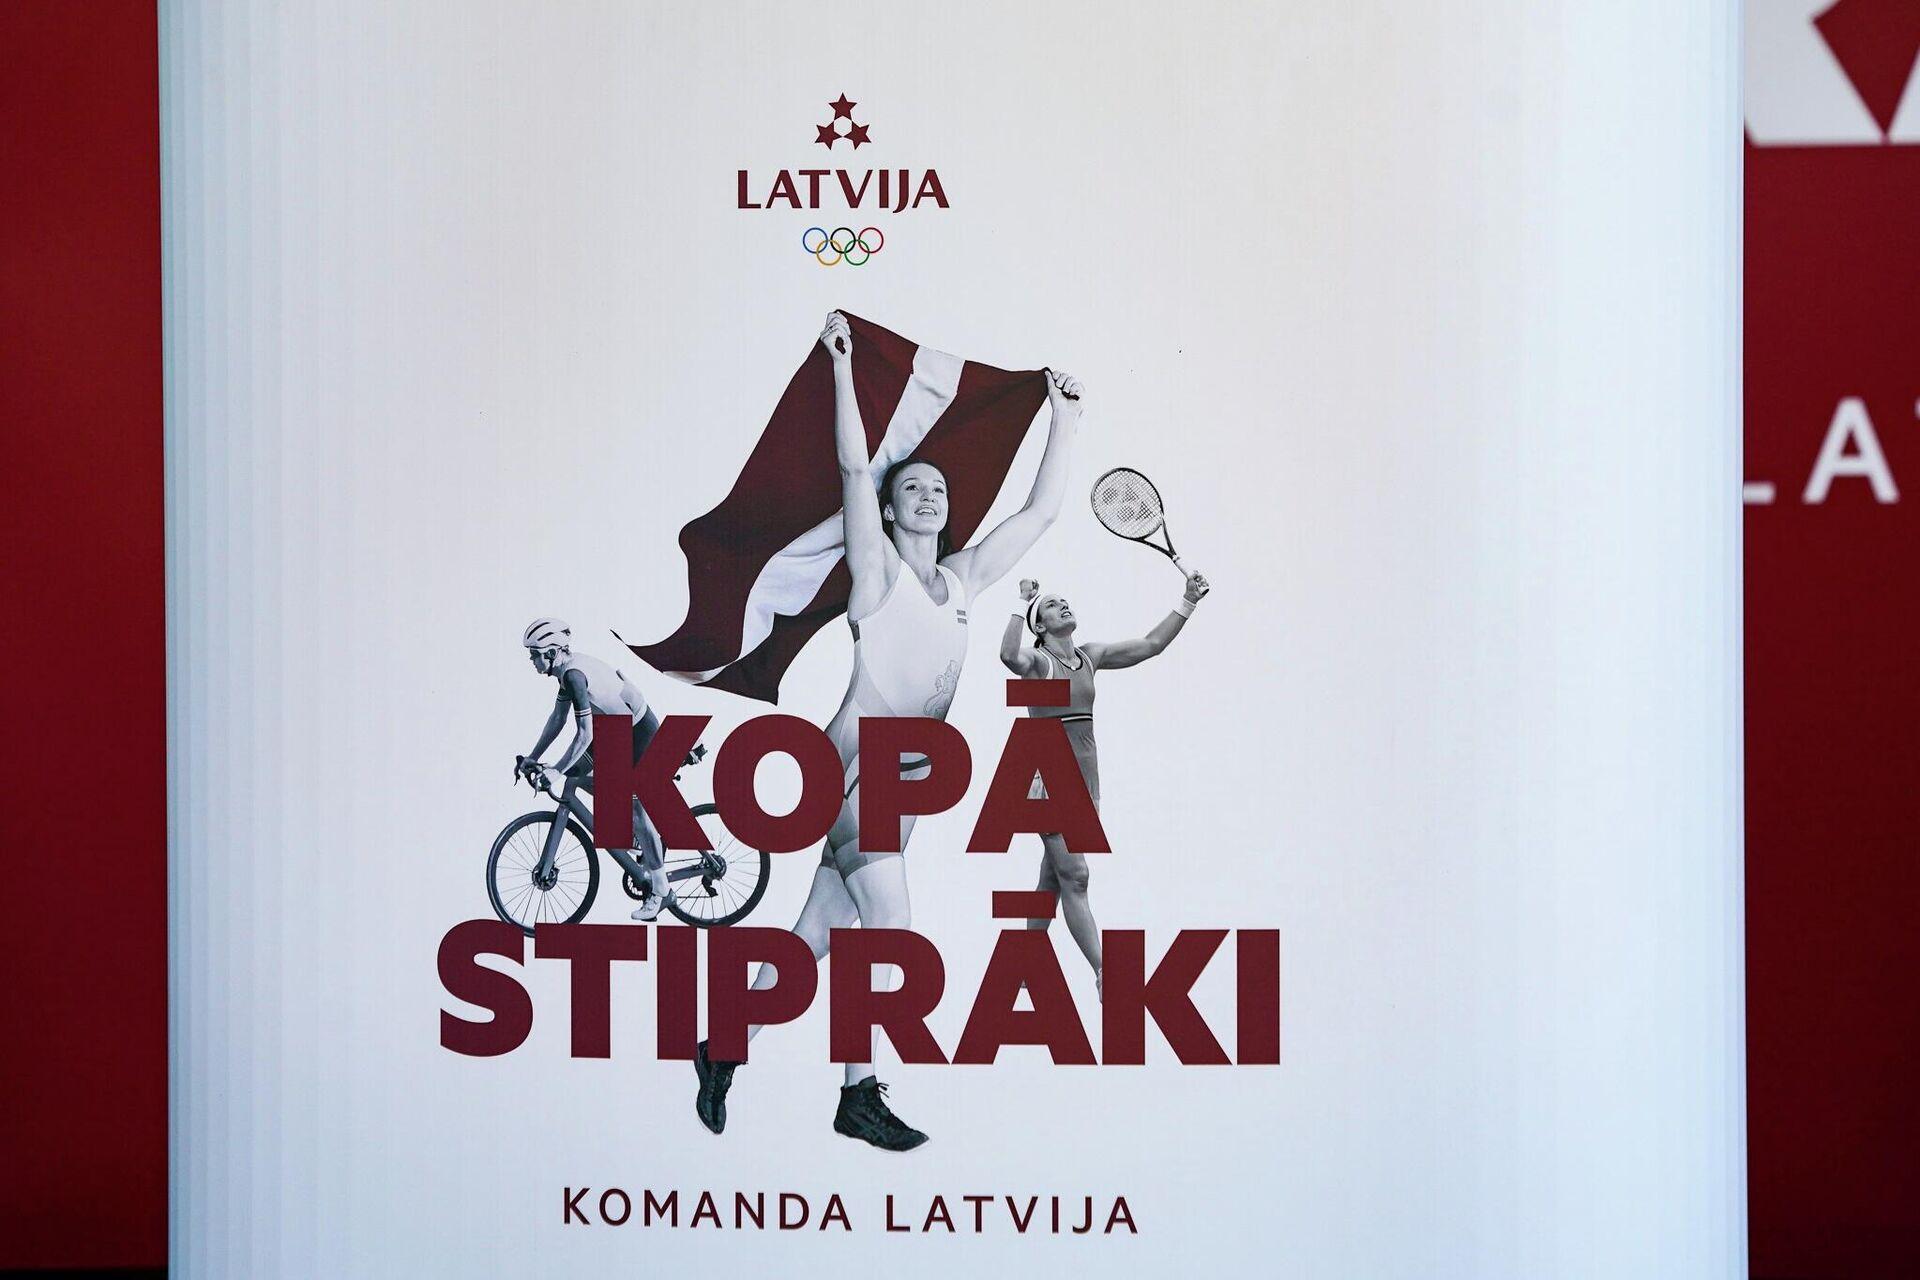 Плакат Латвийского олимпийского комитета в поддержку команды на Олимпиаде в Токио - Sputnik Латвия, 1920, 18.07.2021